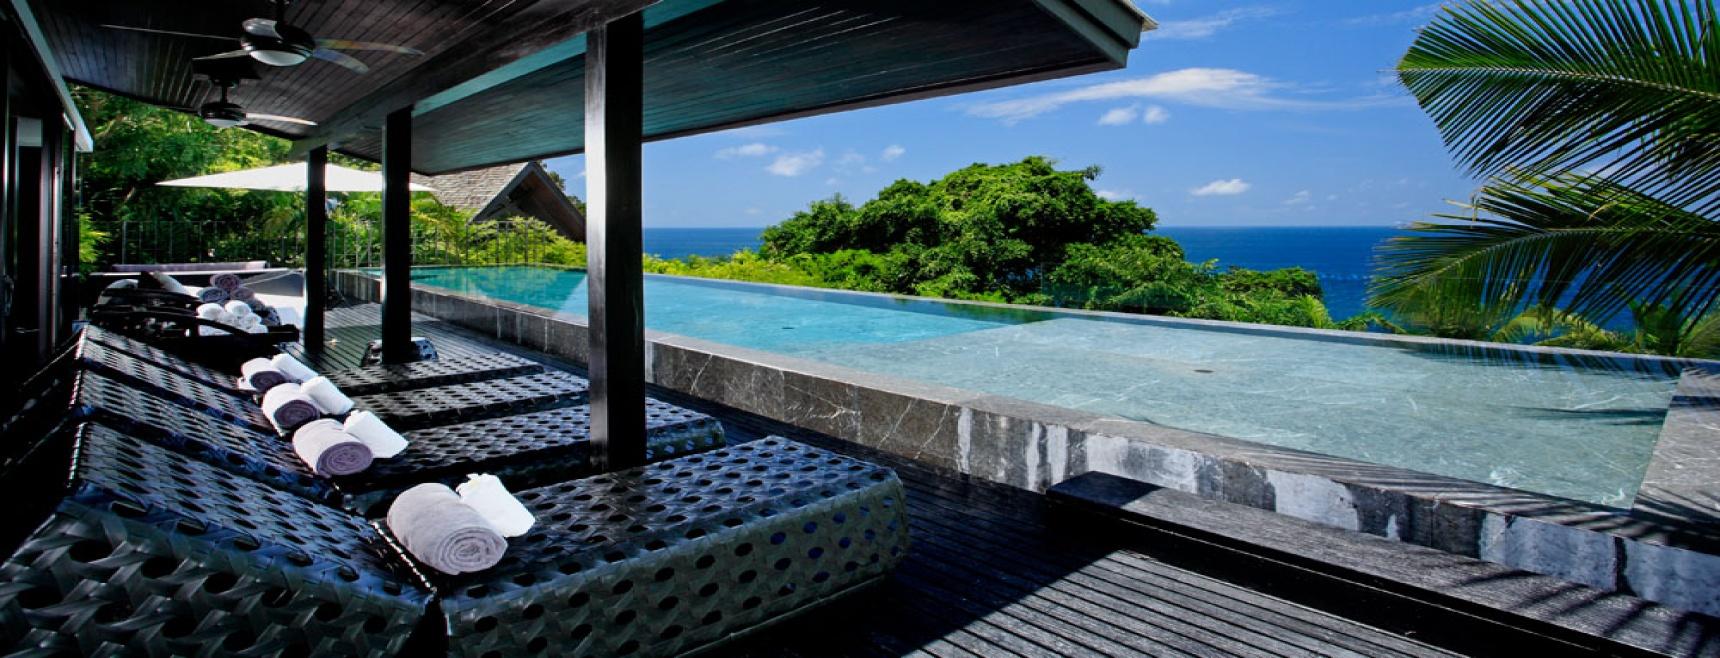 Phuket Private Waterfront Villa Villa Yang Kamala